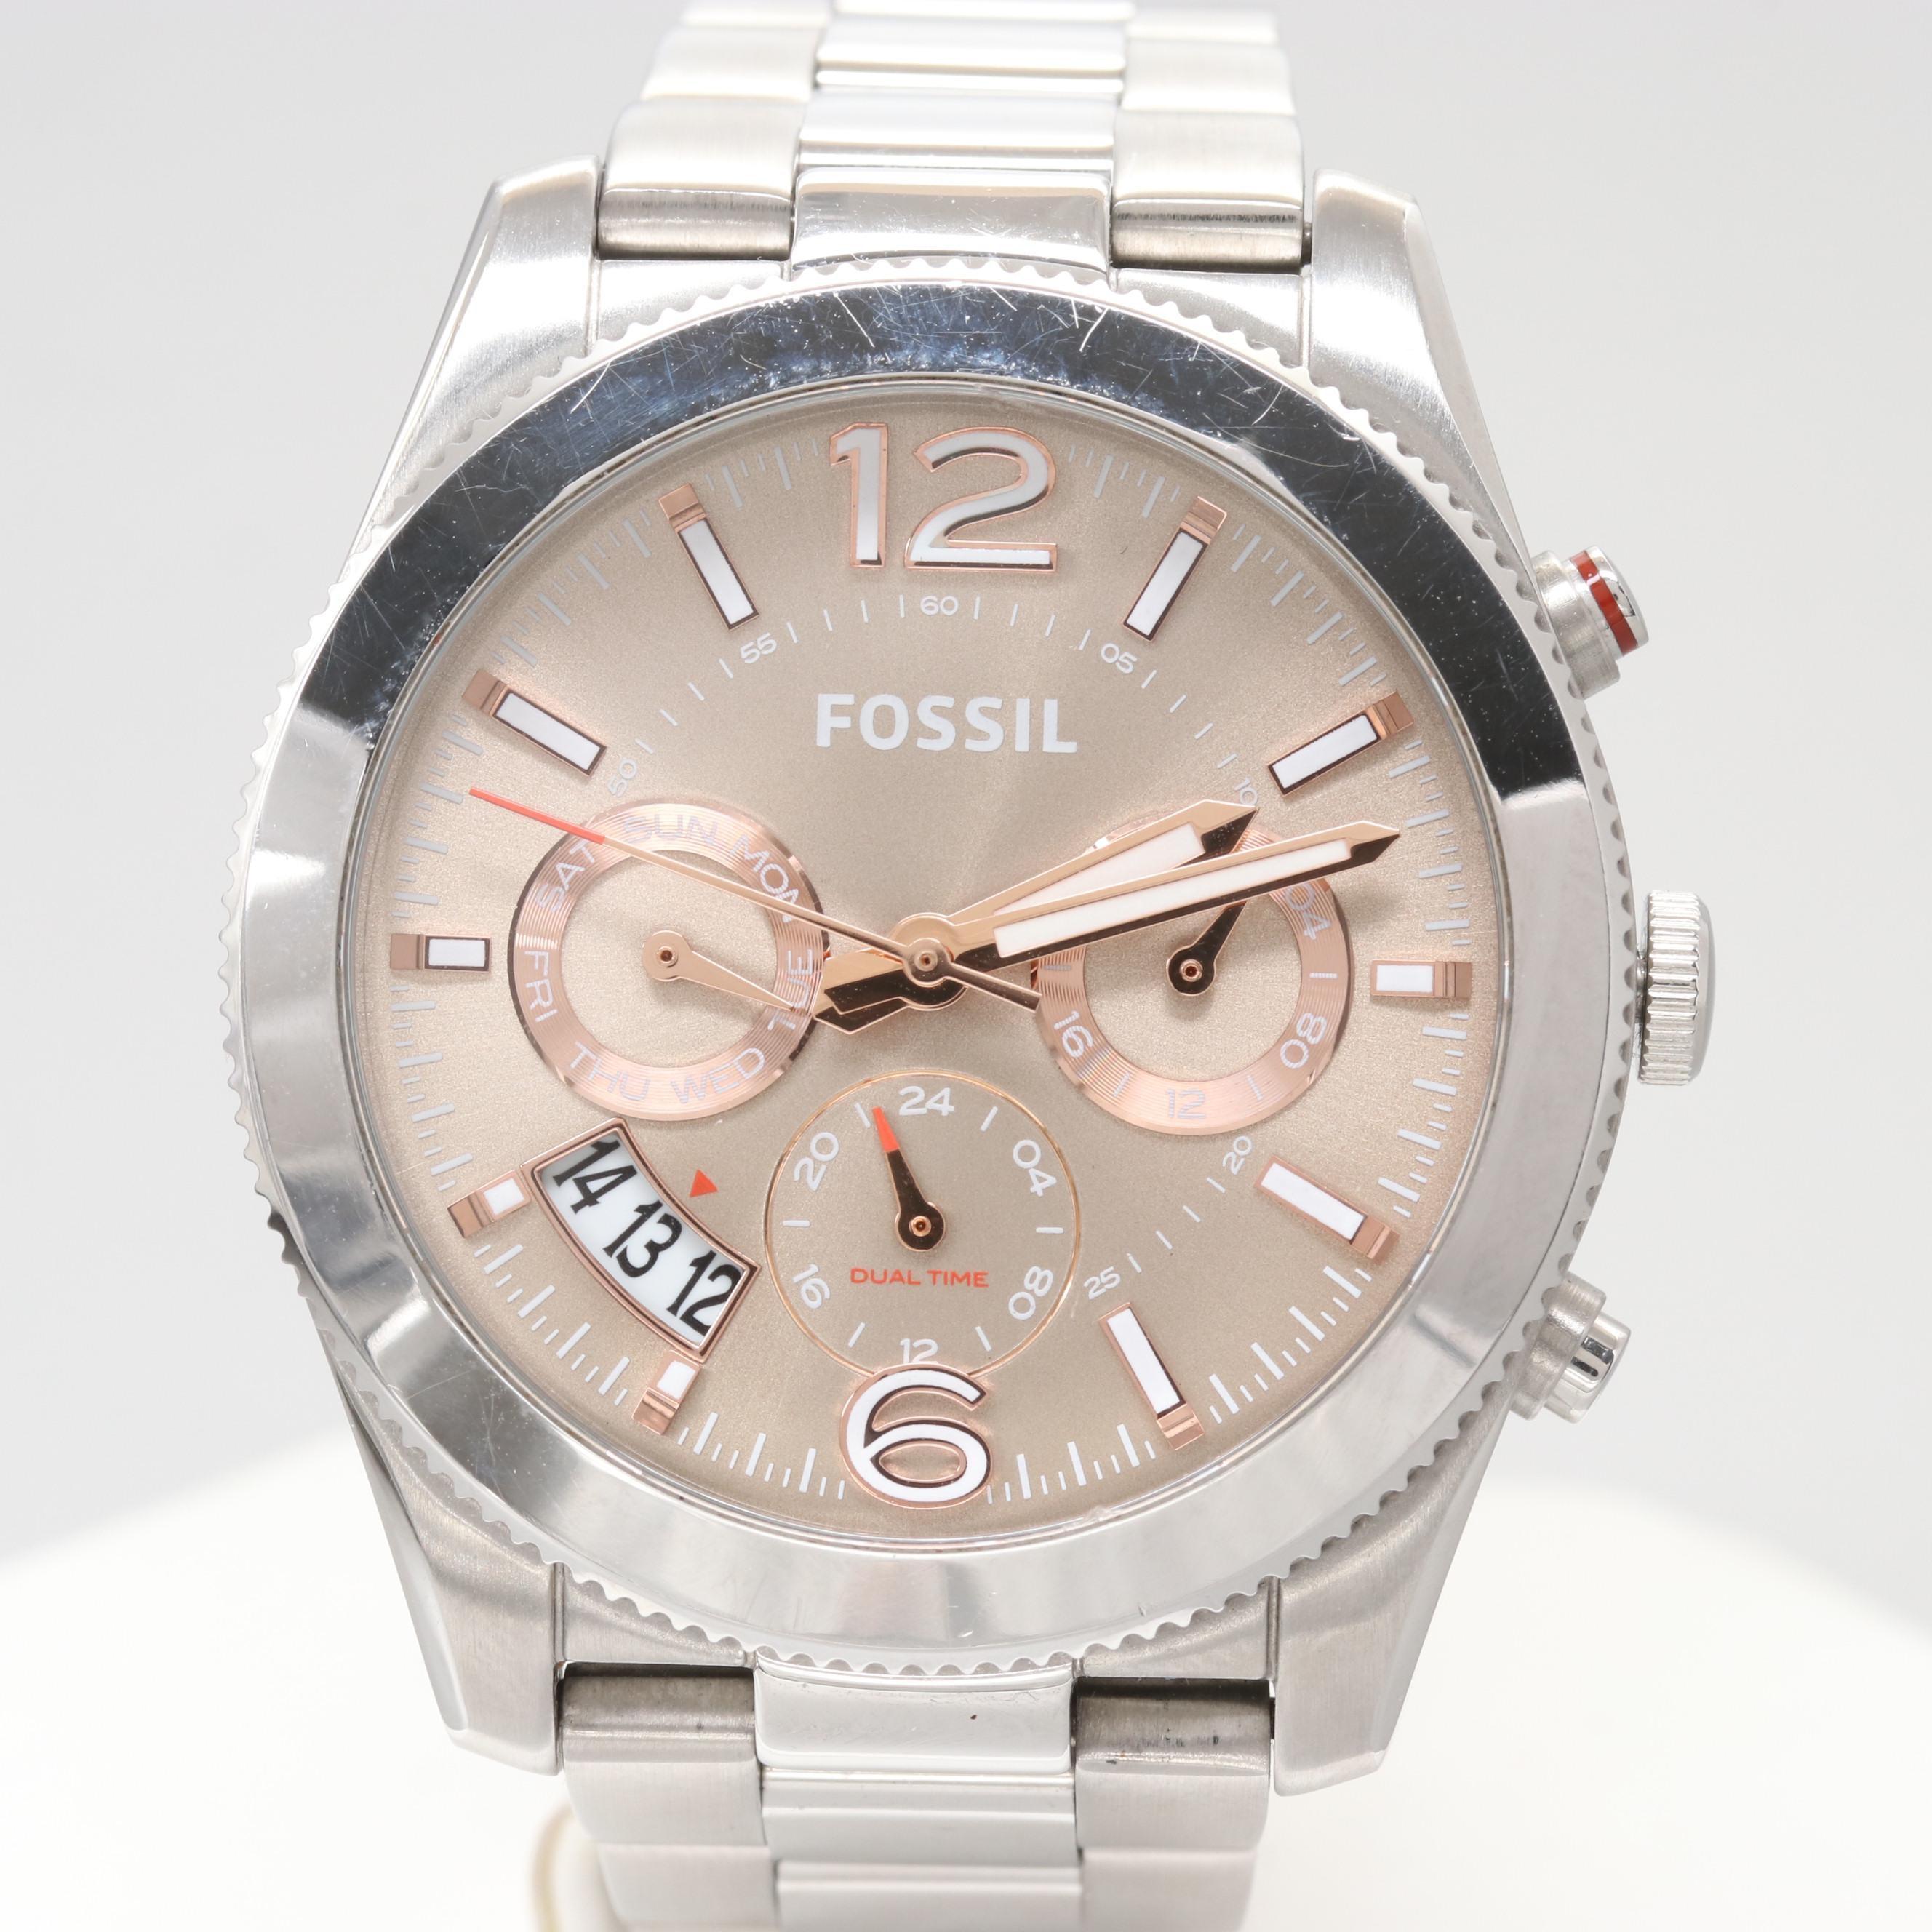 Fossil E54146 Stainless Steel Quartz Wristwatch